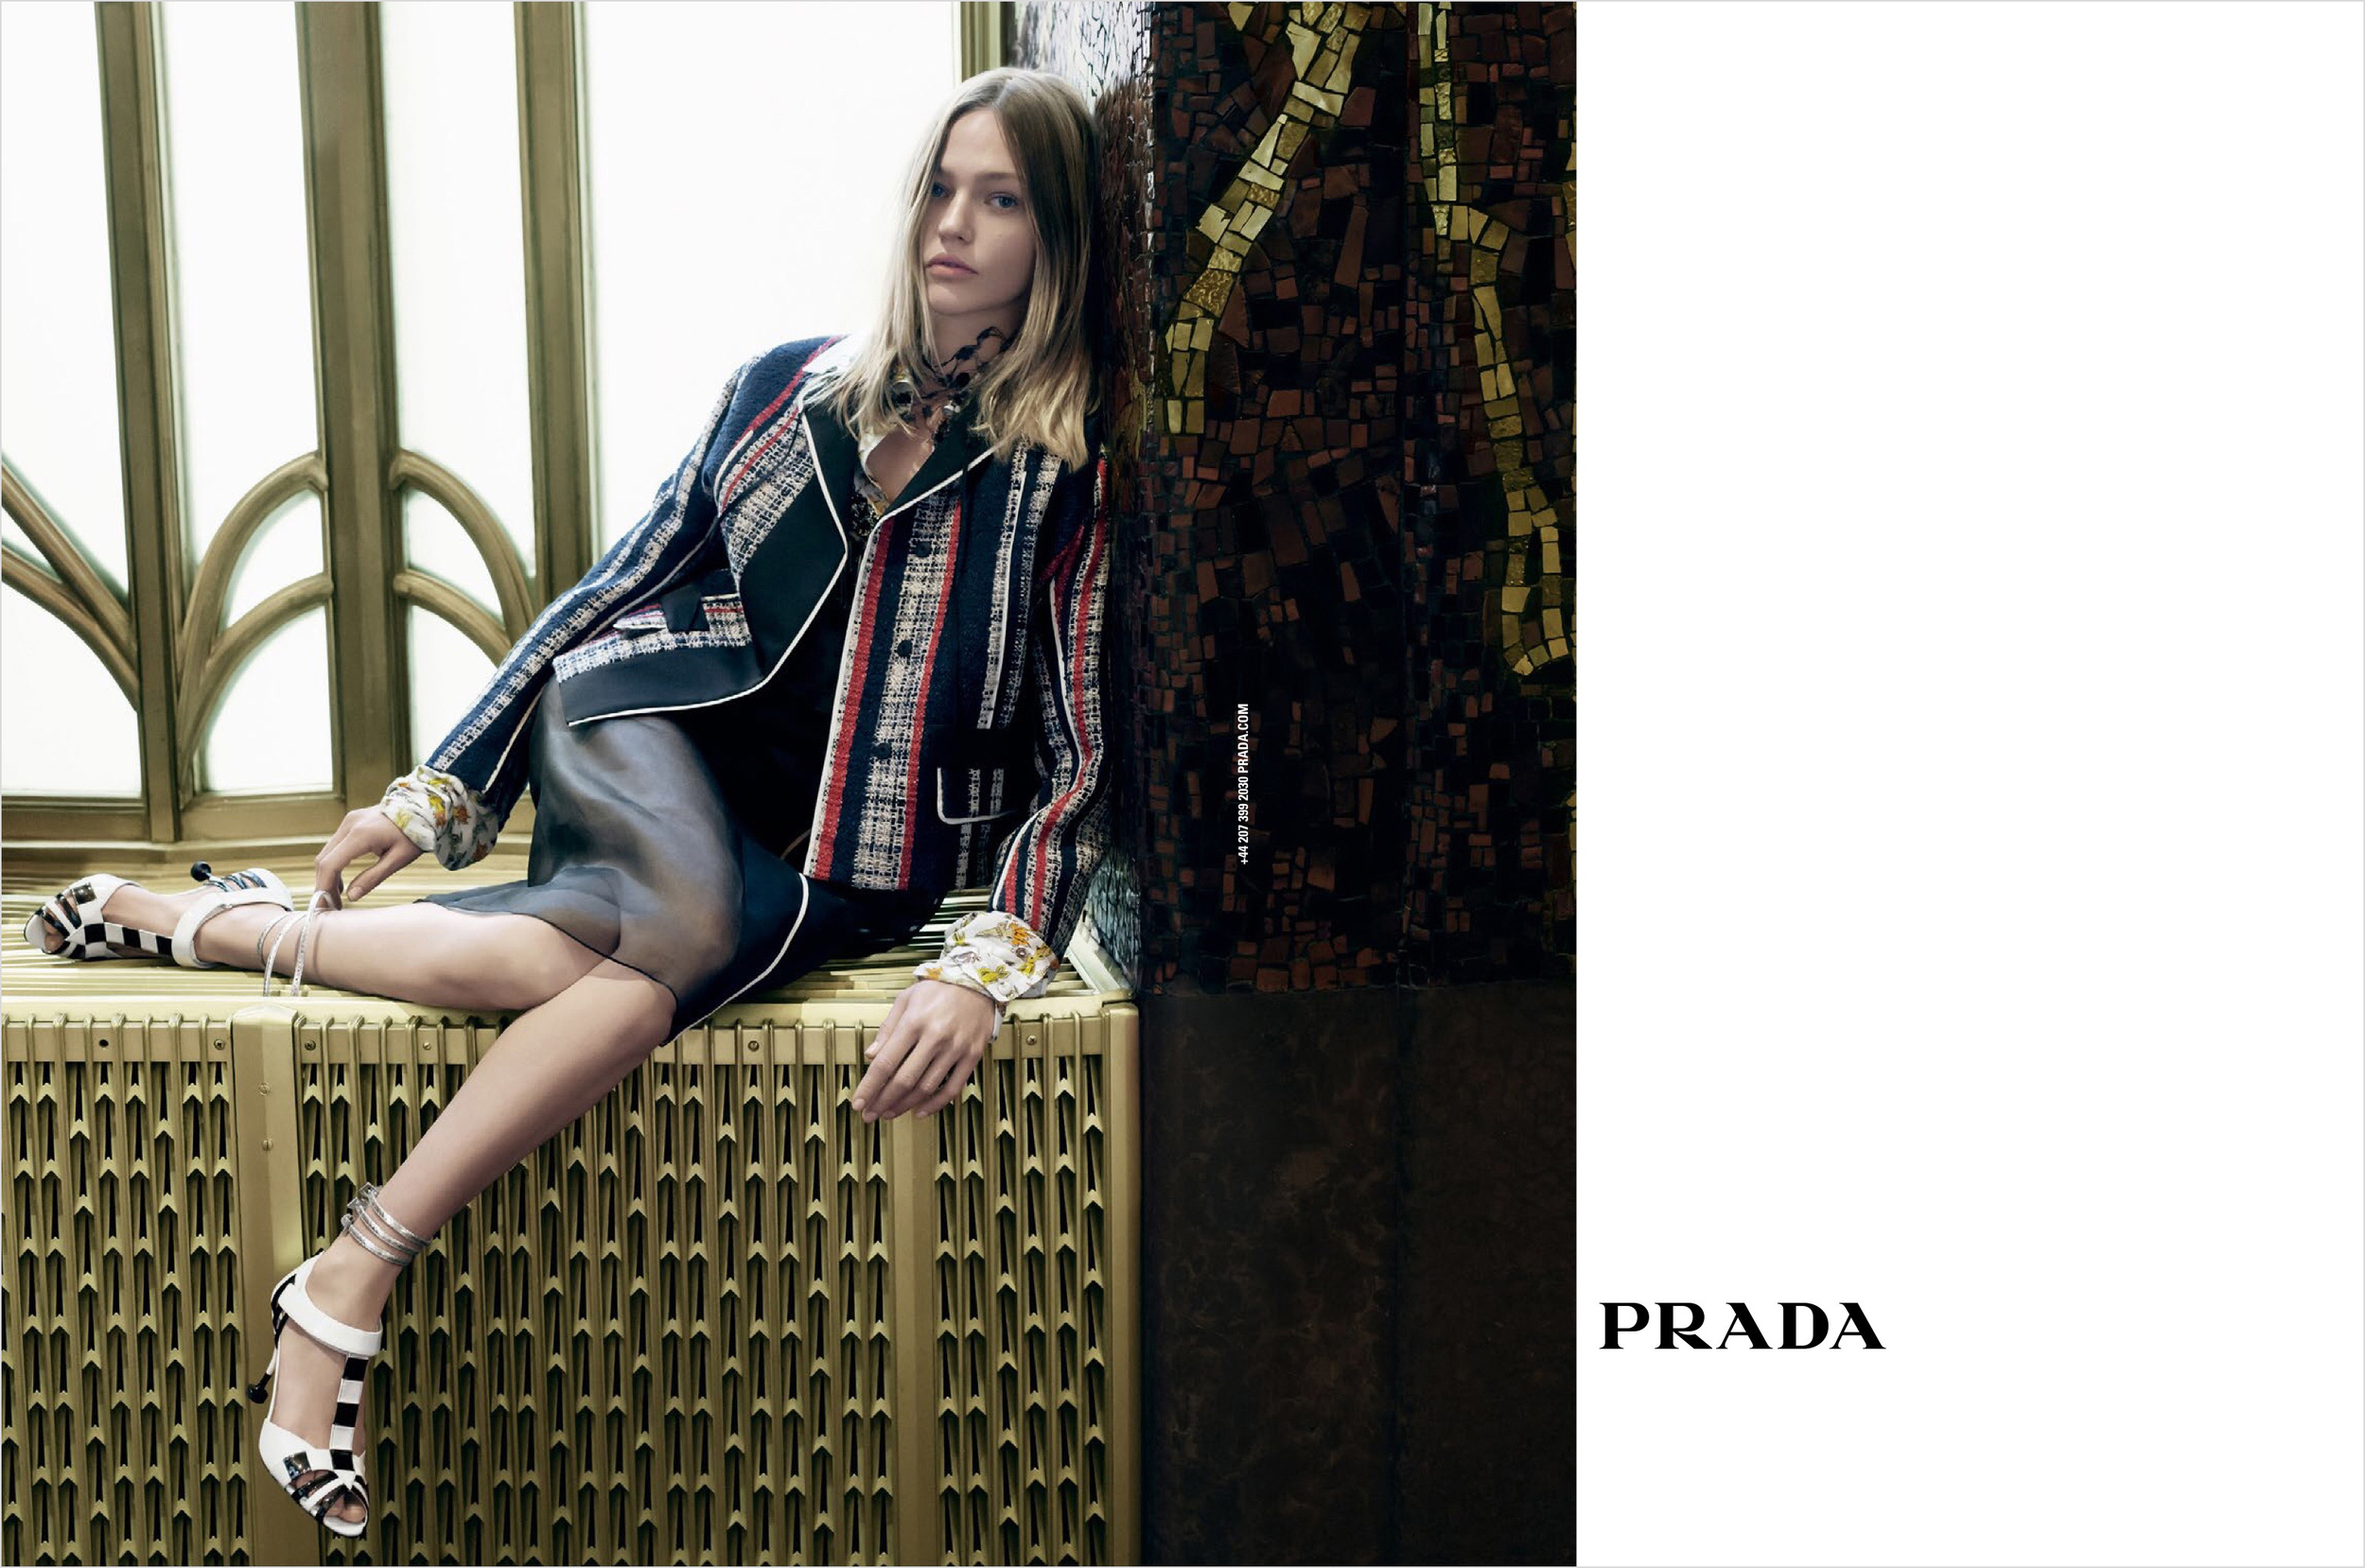 prada-spring-2016-ad-campaign-the-impression-004.jpg